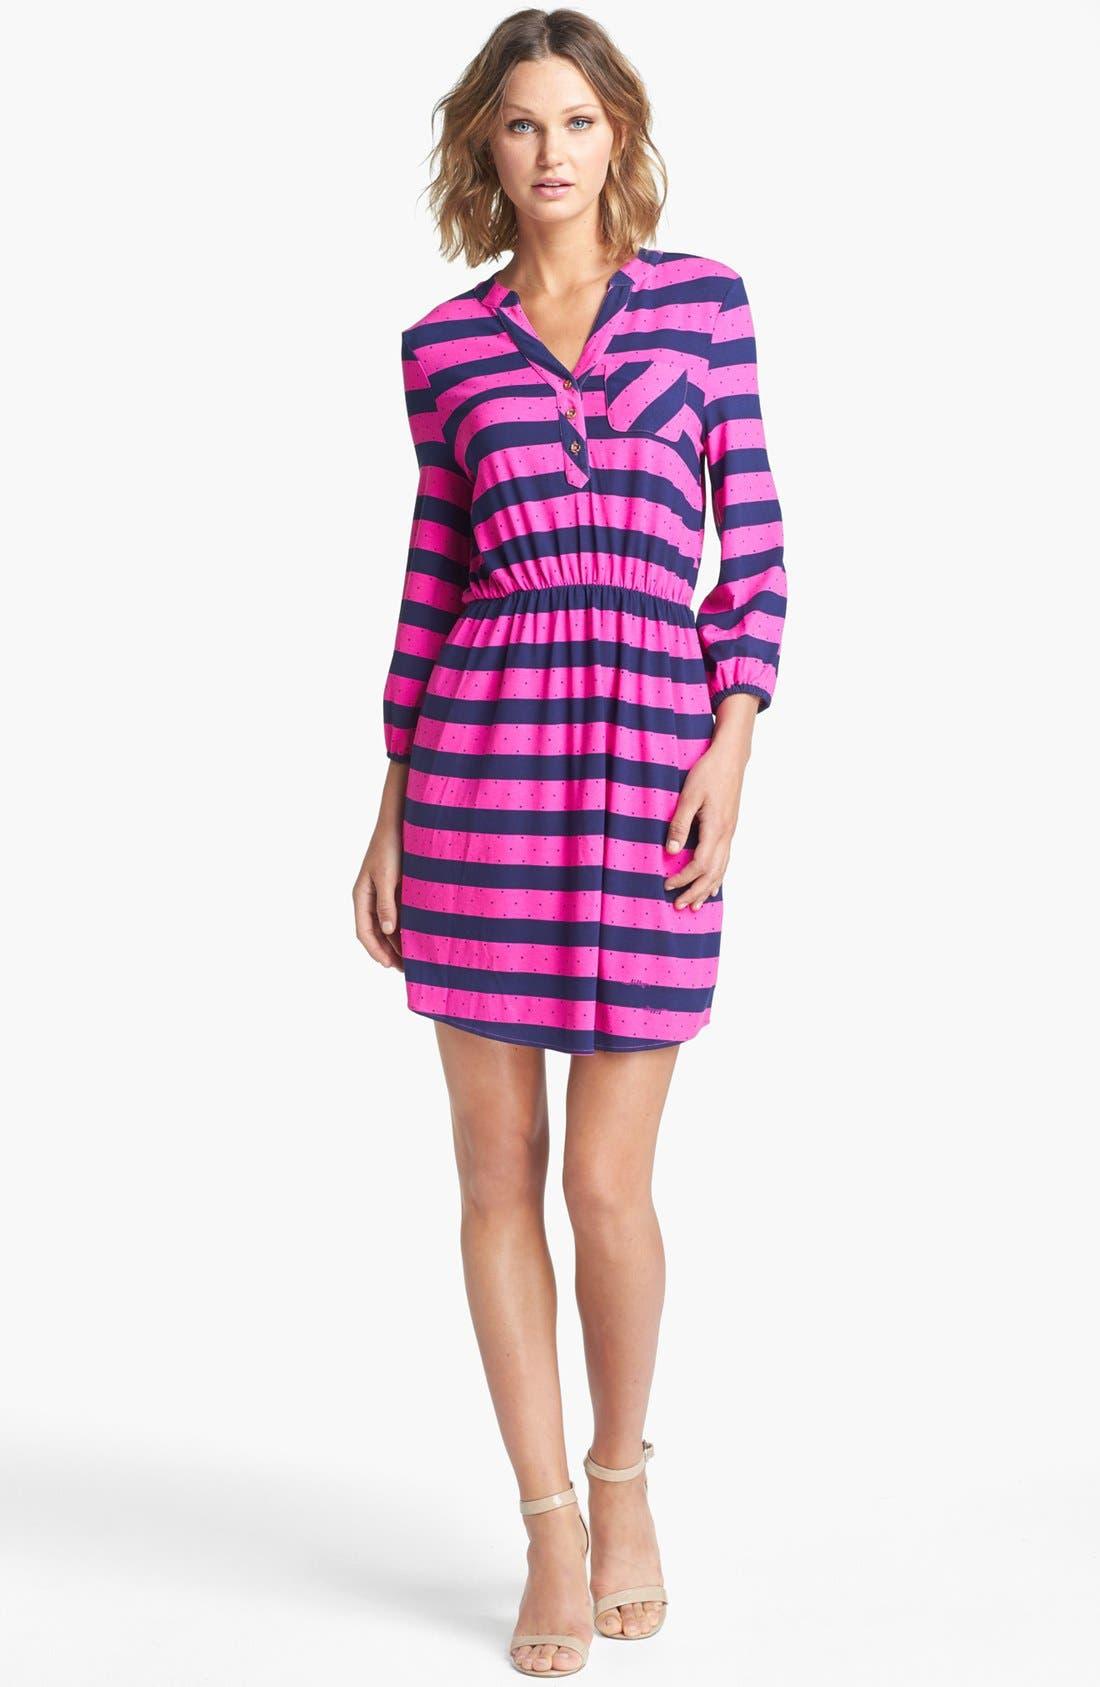 Main Image - Lilly Pulitzer® 'Beckett' Stripe Shirtdress